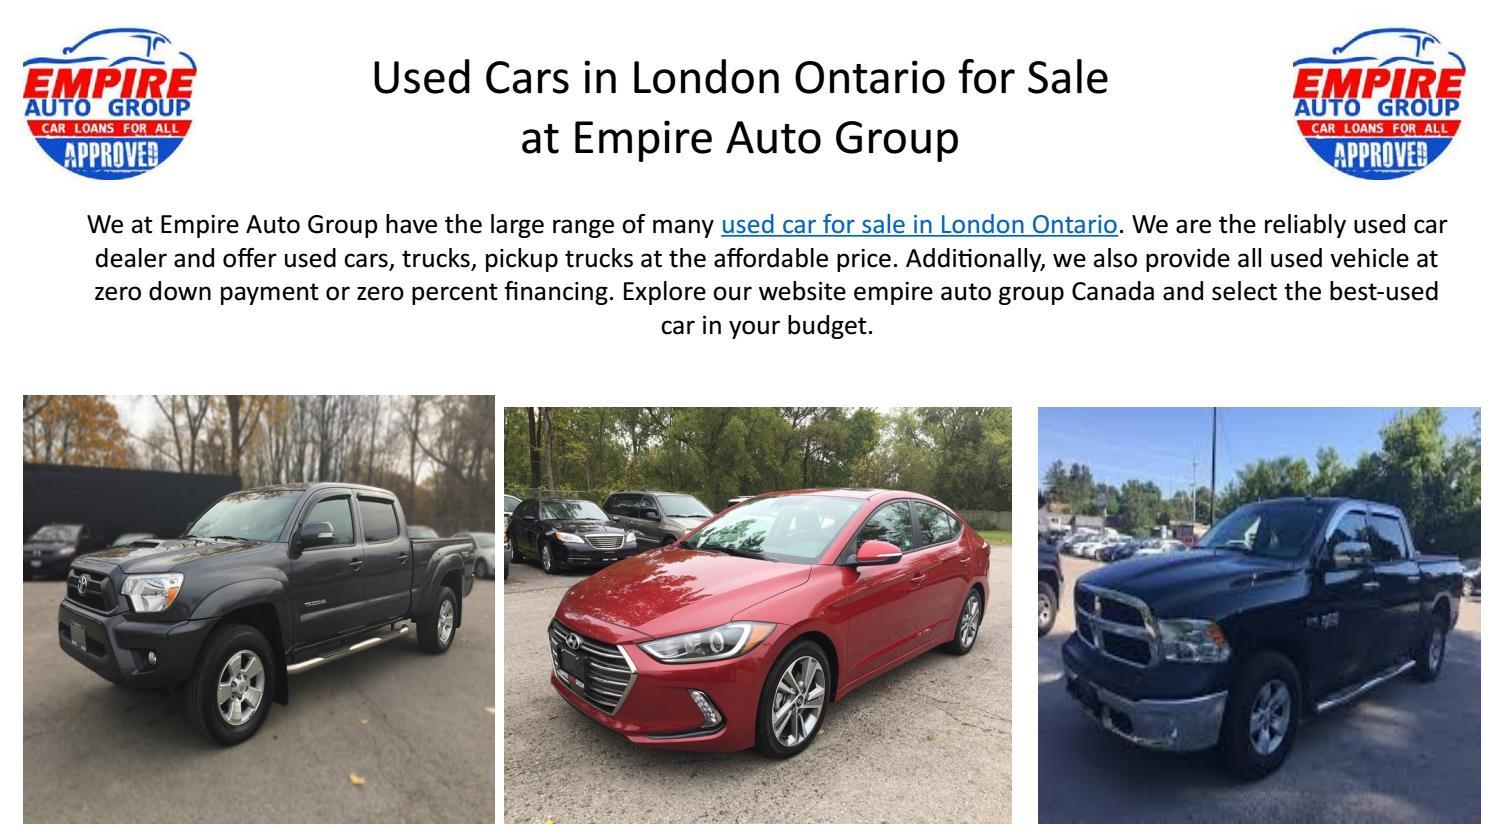 Used Car Dealerships Websites >> London Ontario Car Dealerships By Empire Autogroup Issuu